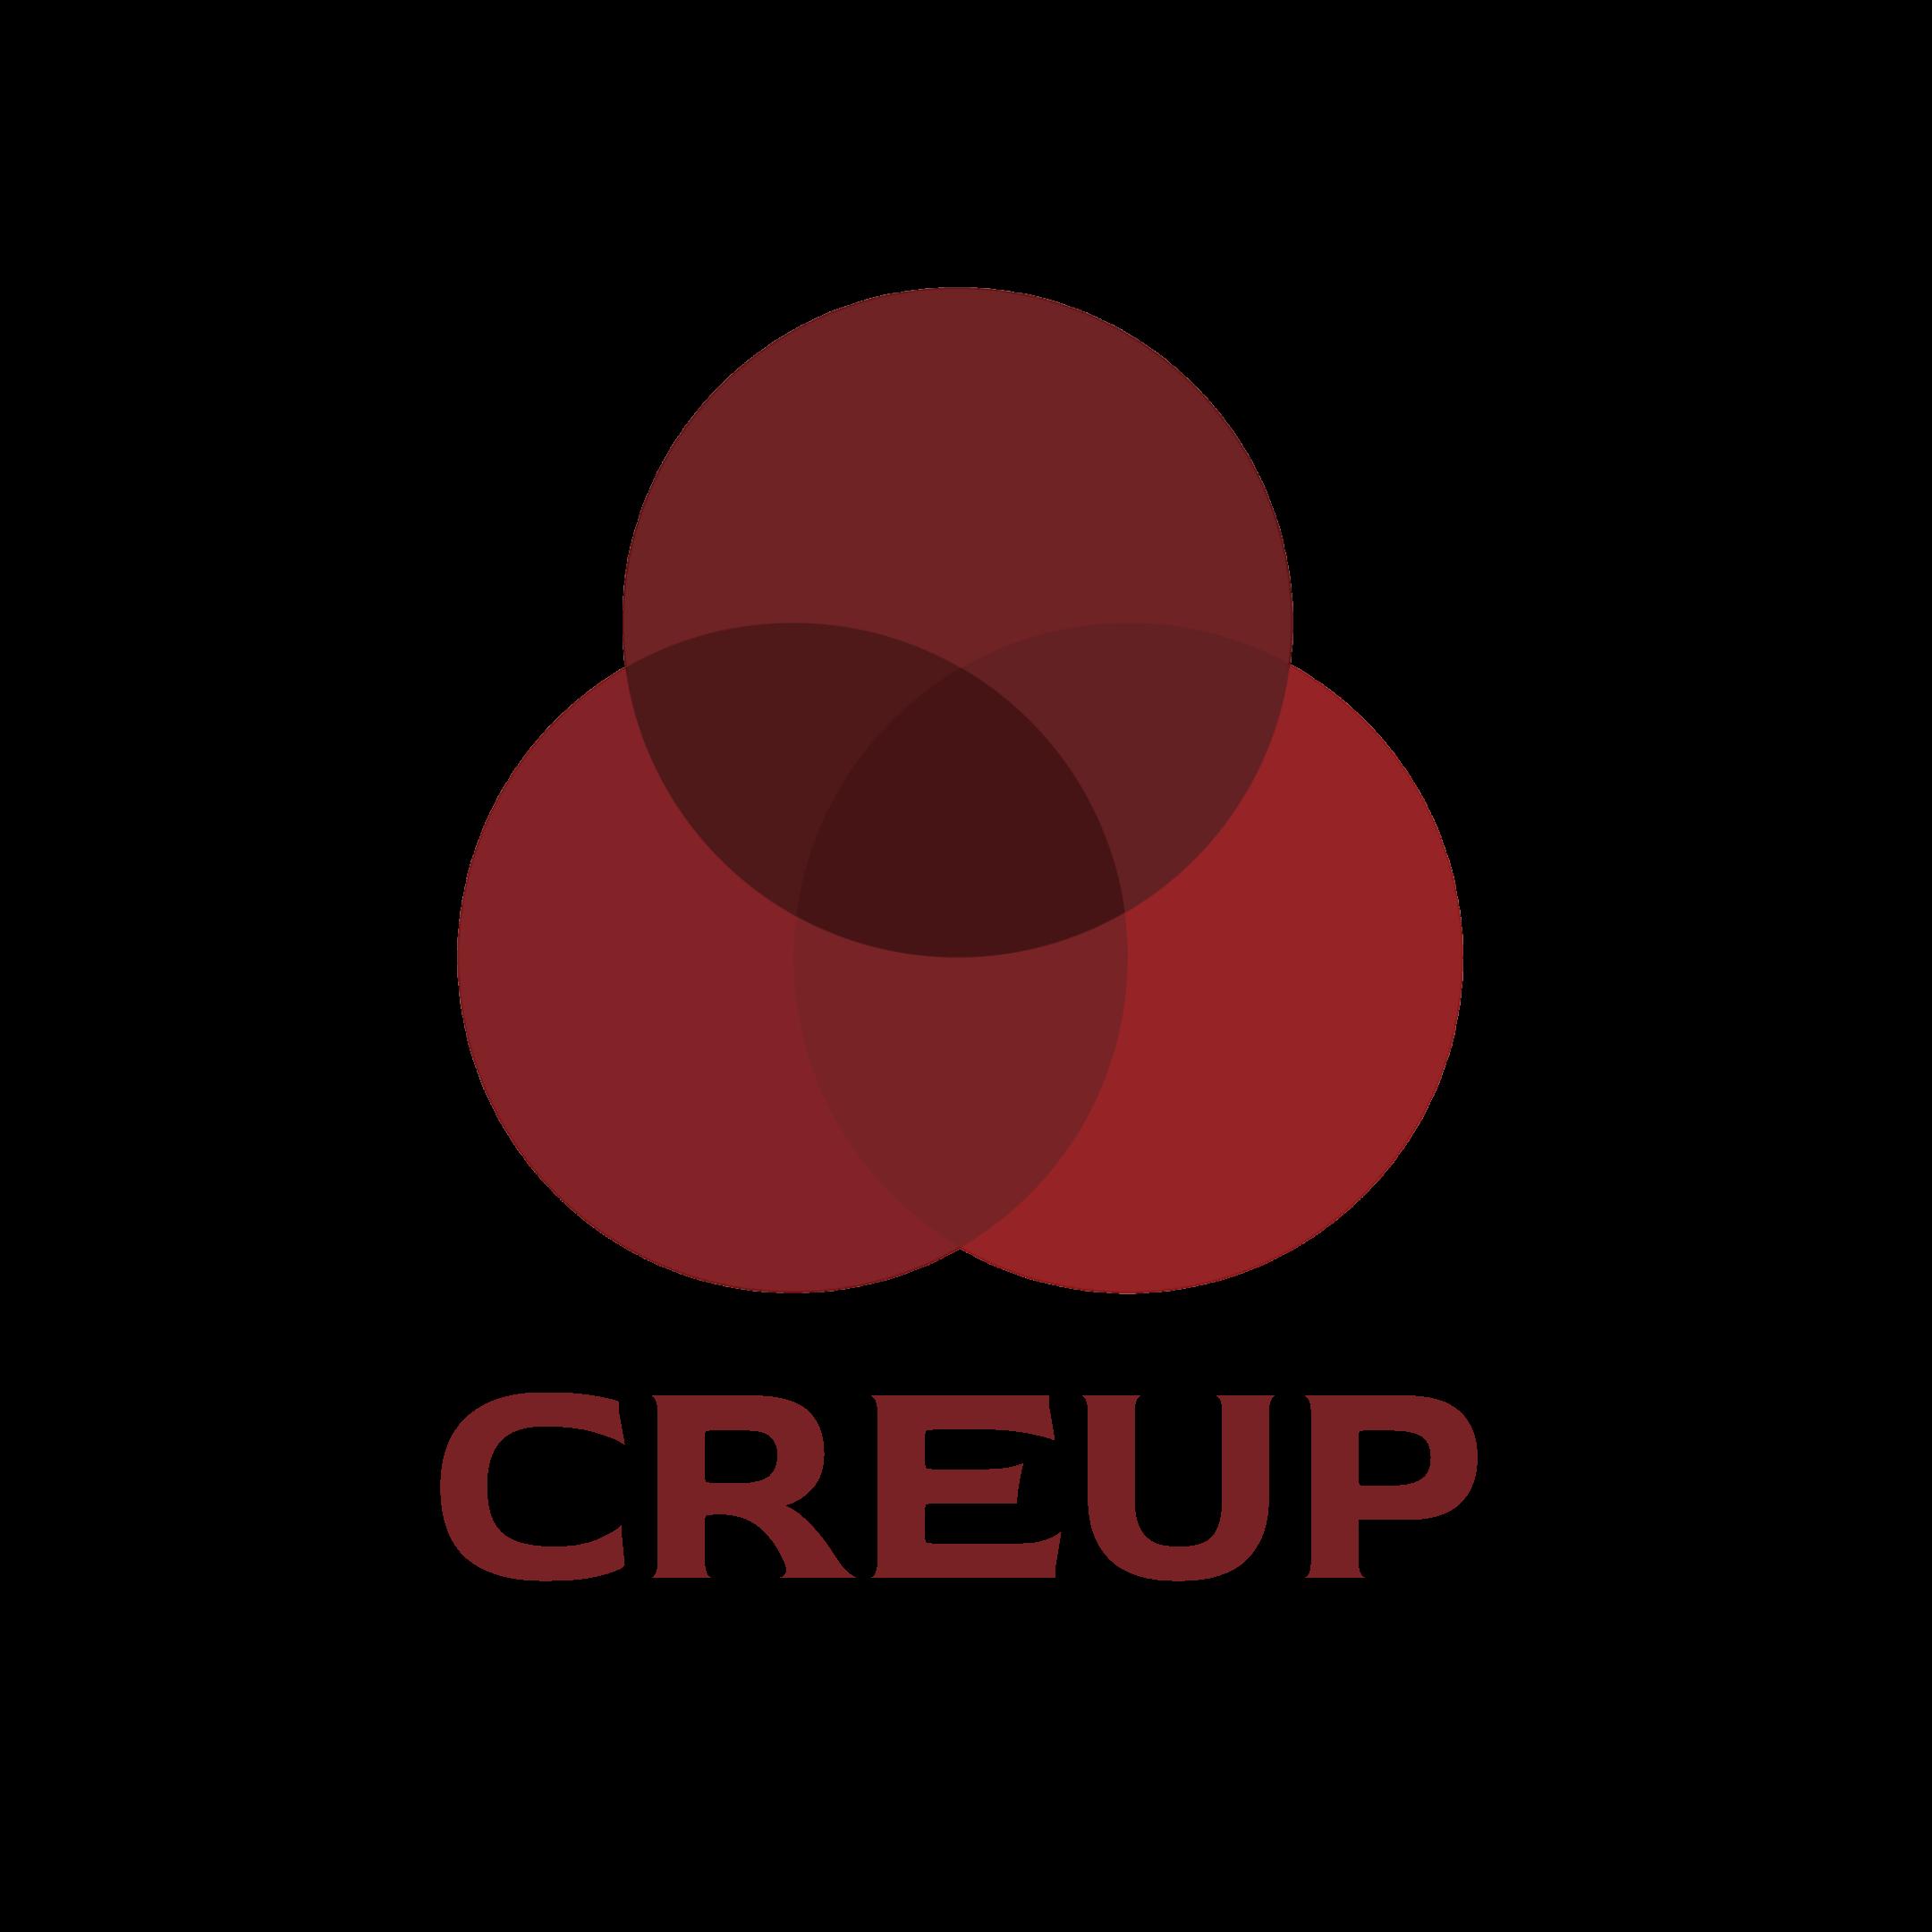 Logotipo-CREUP